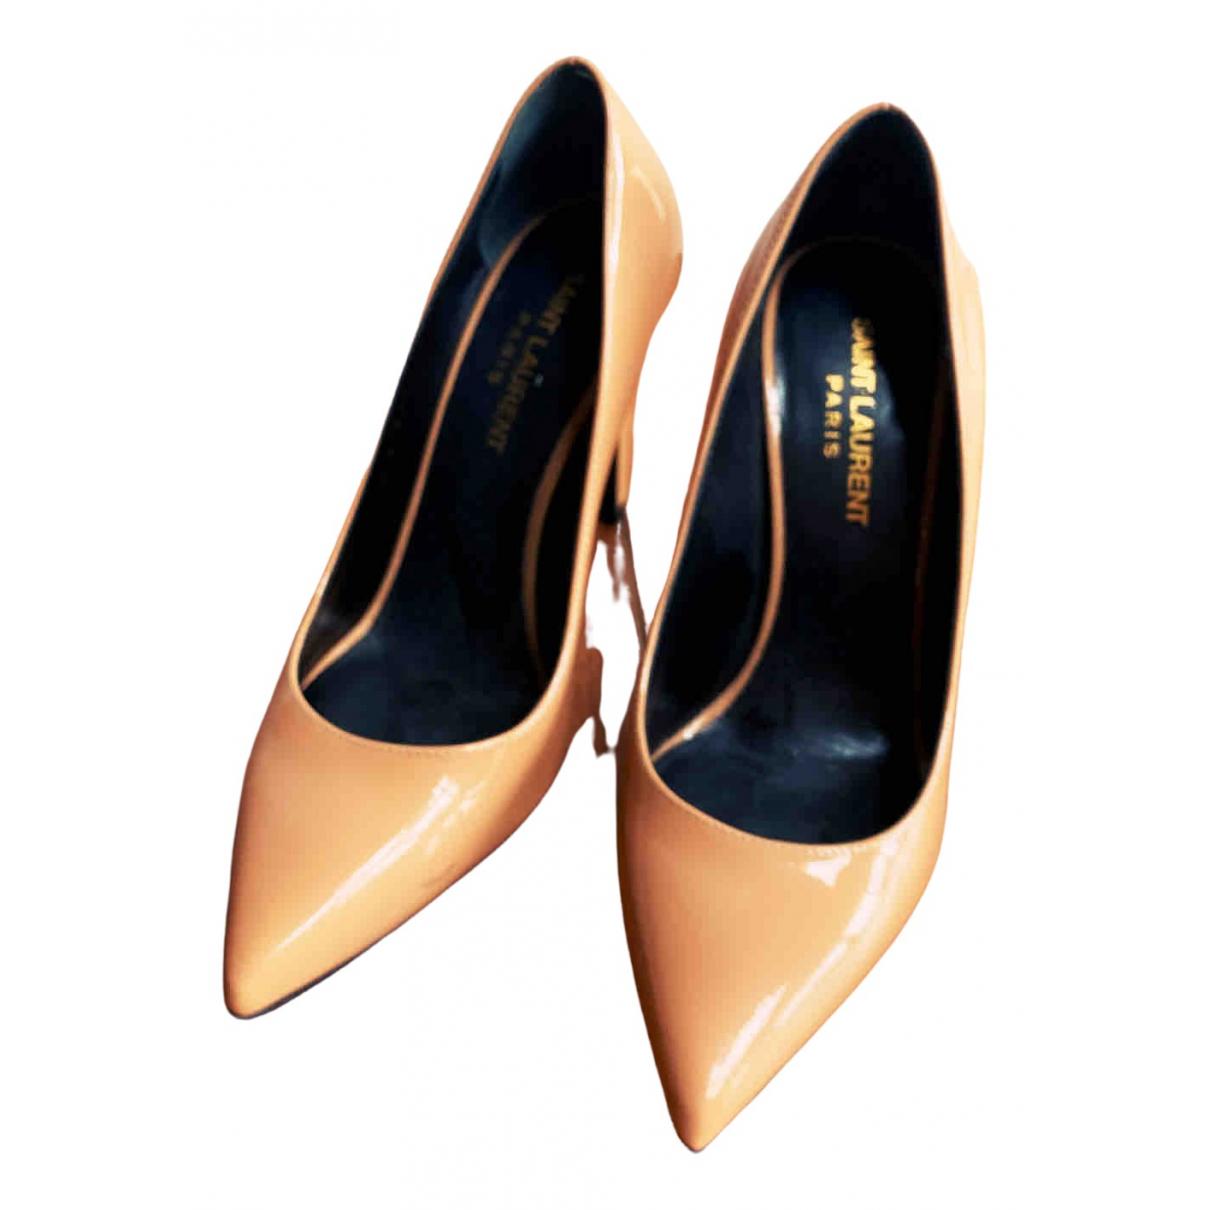 Saint Laurent \N Beige Patent leather Heels for Women 35.5 EU